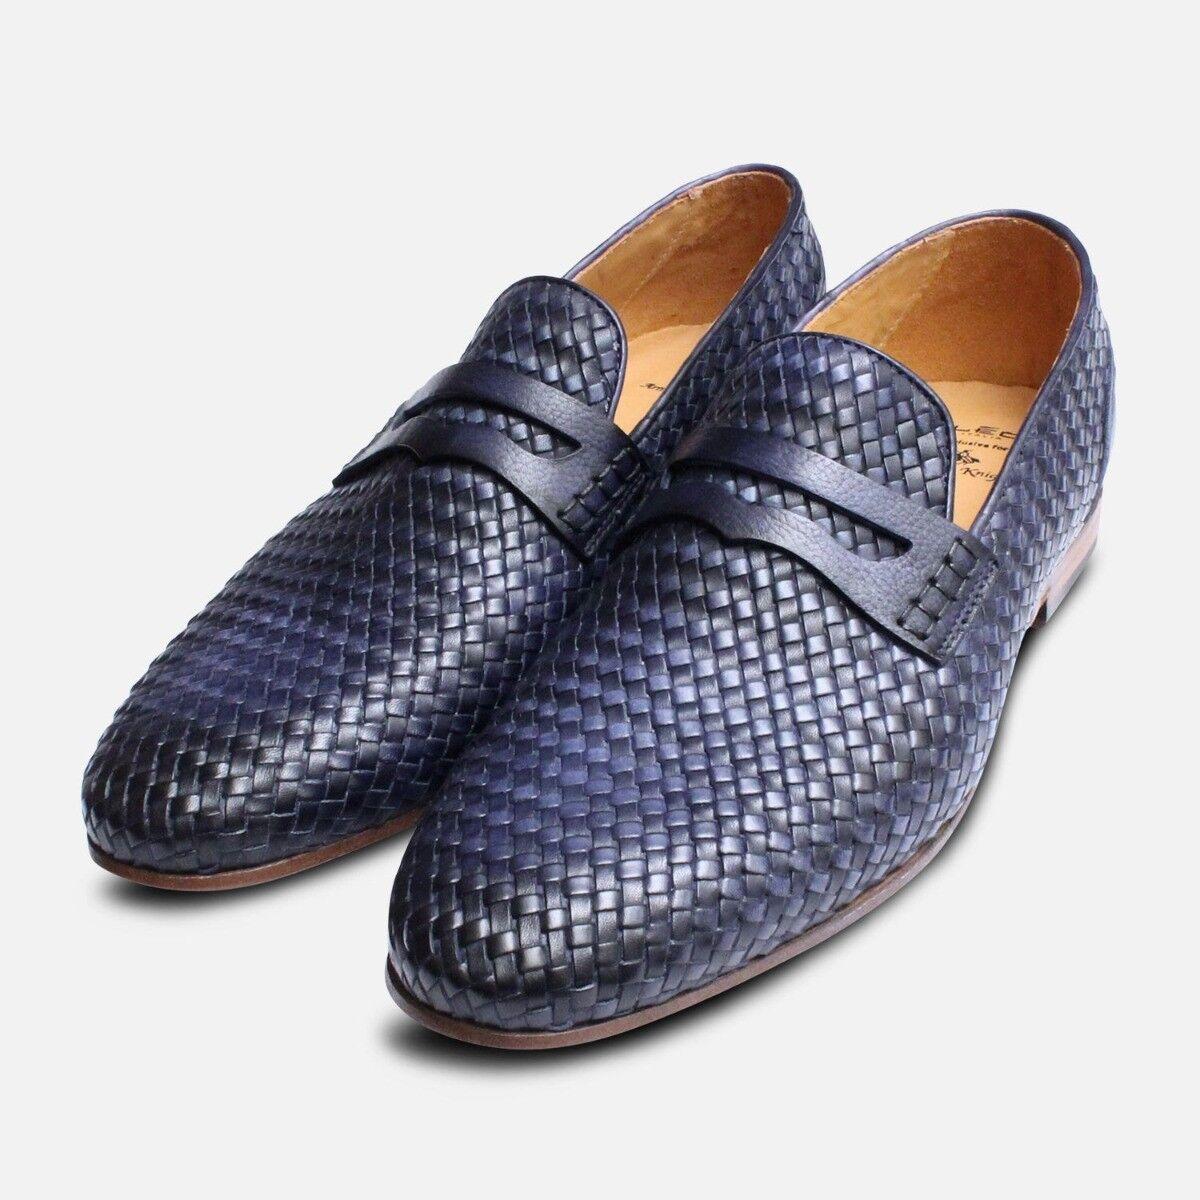 Weave Loafers in Navy bluee by Arthur Knight